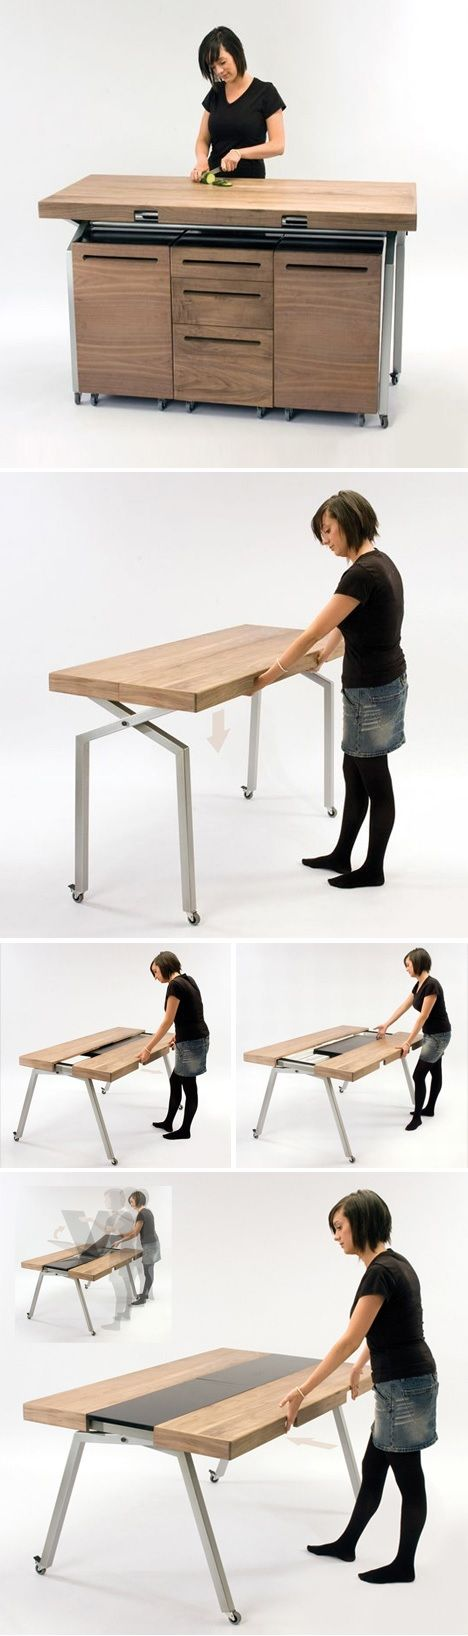 kitchen workspace converts to dining table dornobcom  : 142fc4c068eadc9ecc761228c2918b03 from www.pinterest.com size 468 x 1636 jpeg 76kB